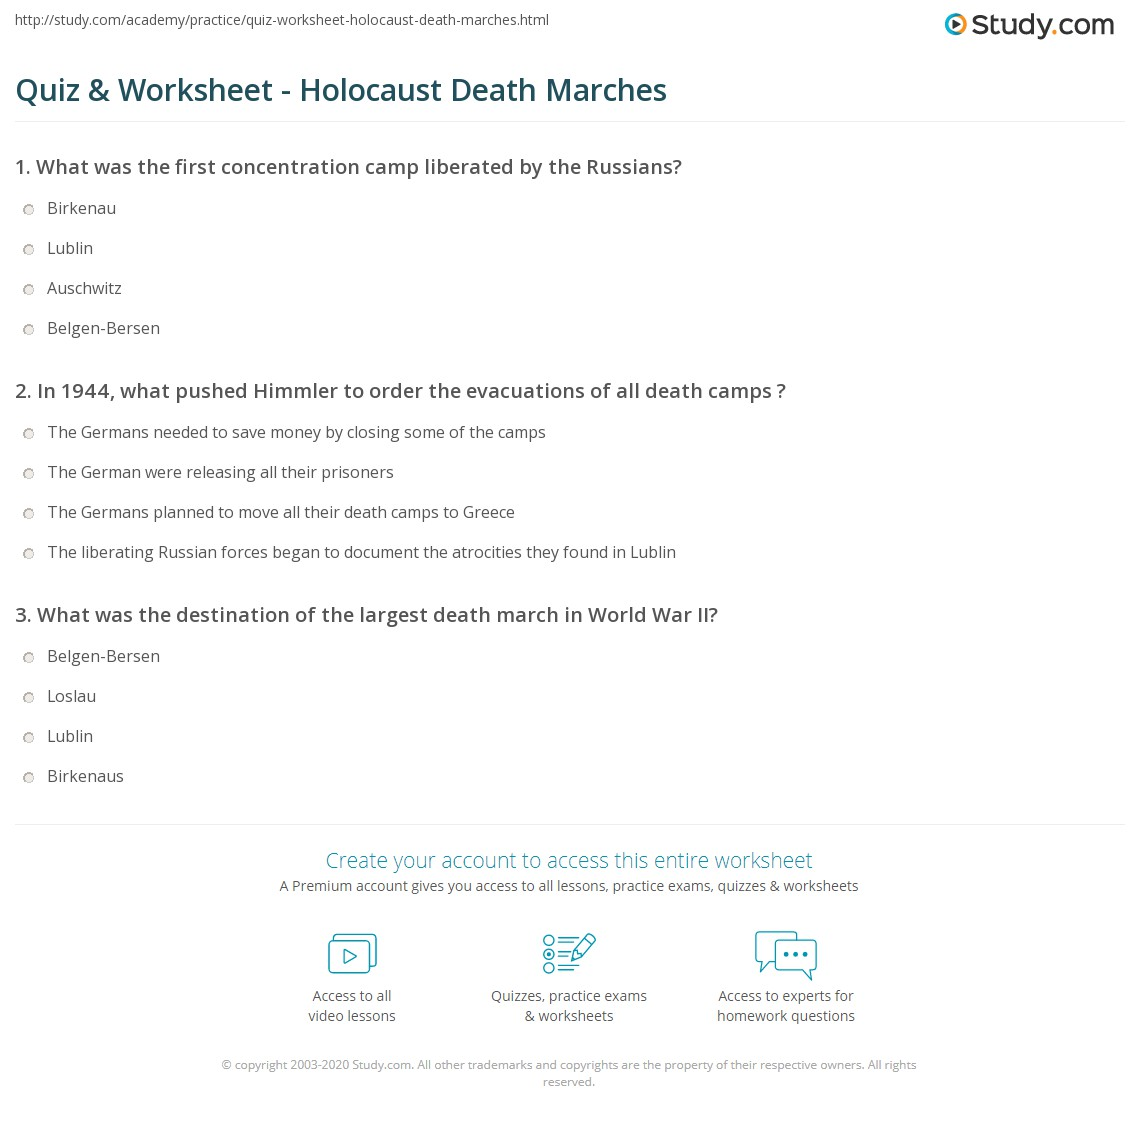 commonlit answers key - psychologyarticles info